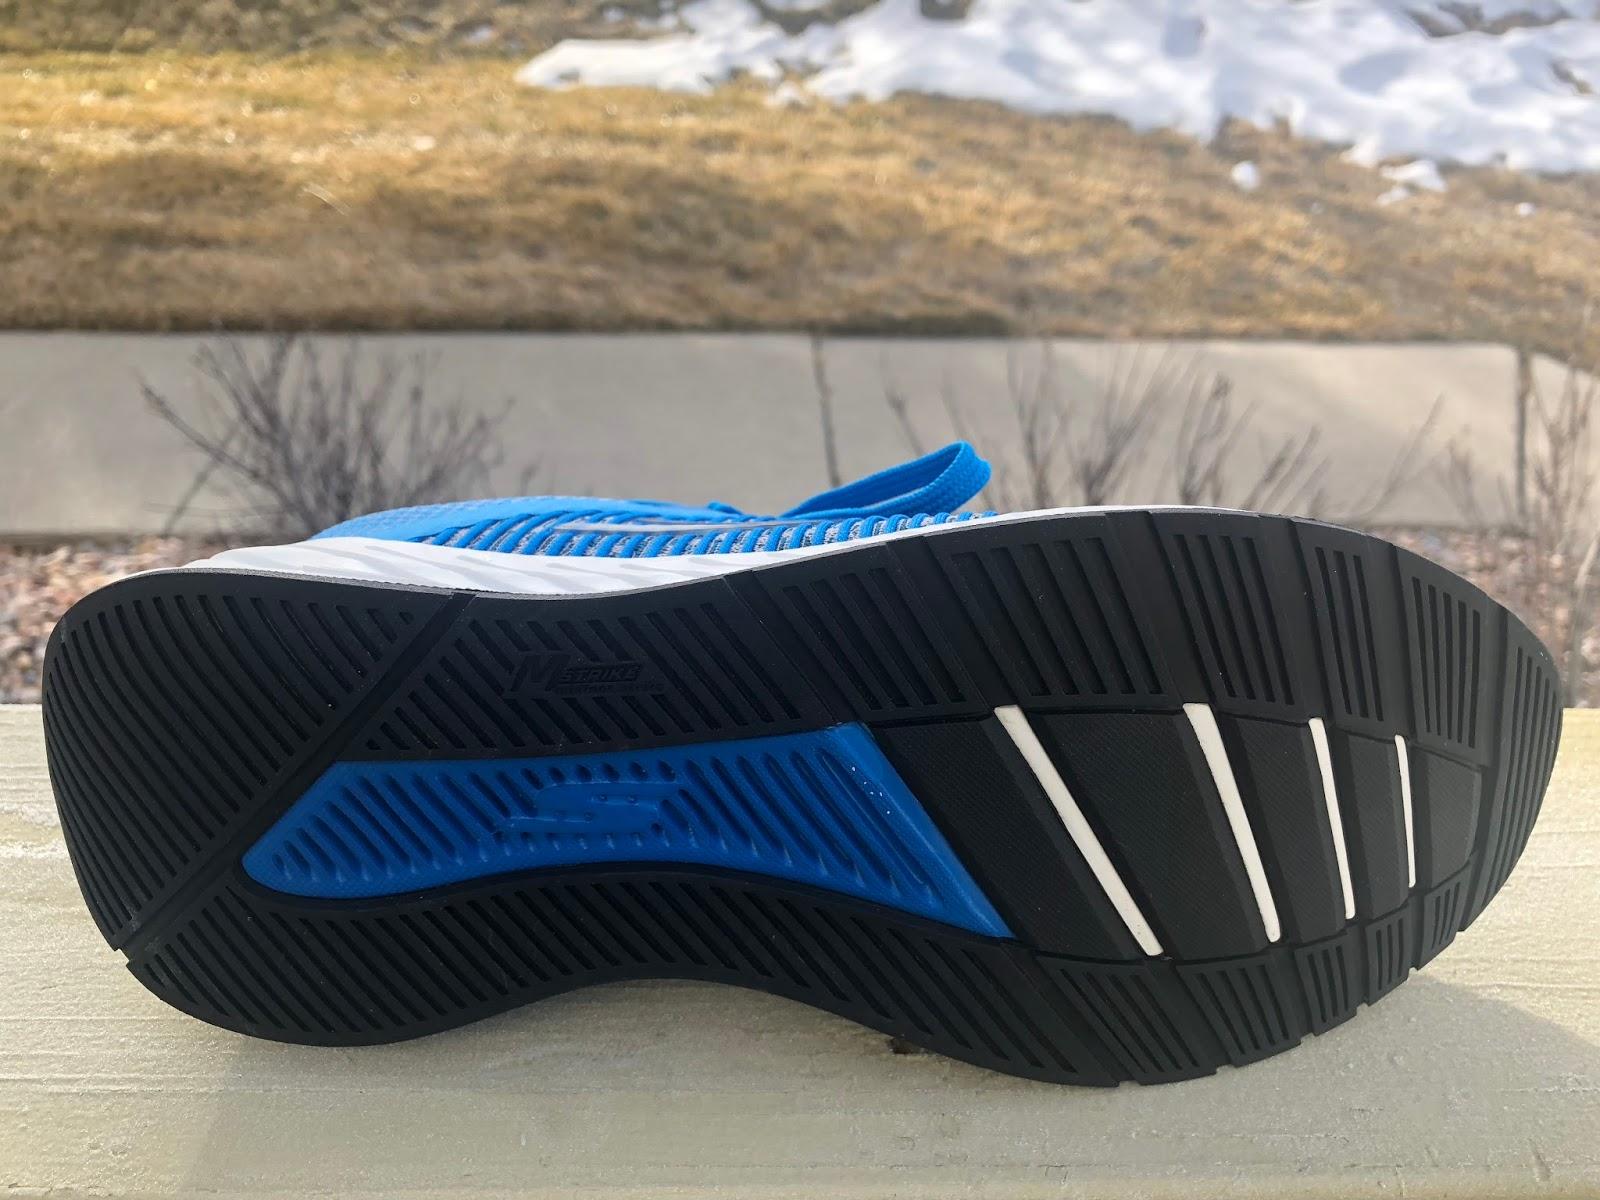 15d02b3371b0 Road Trail Run  Skechers Performance GO Run Forza 3 Review  Seamless ...